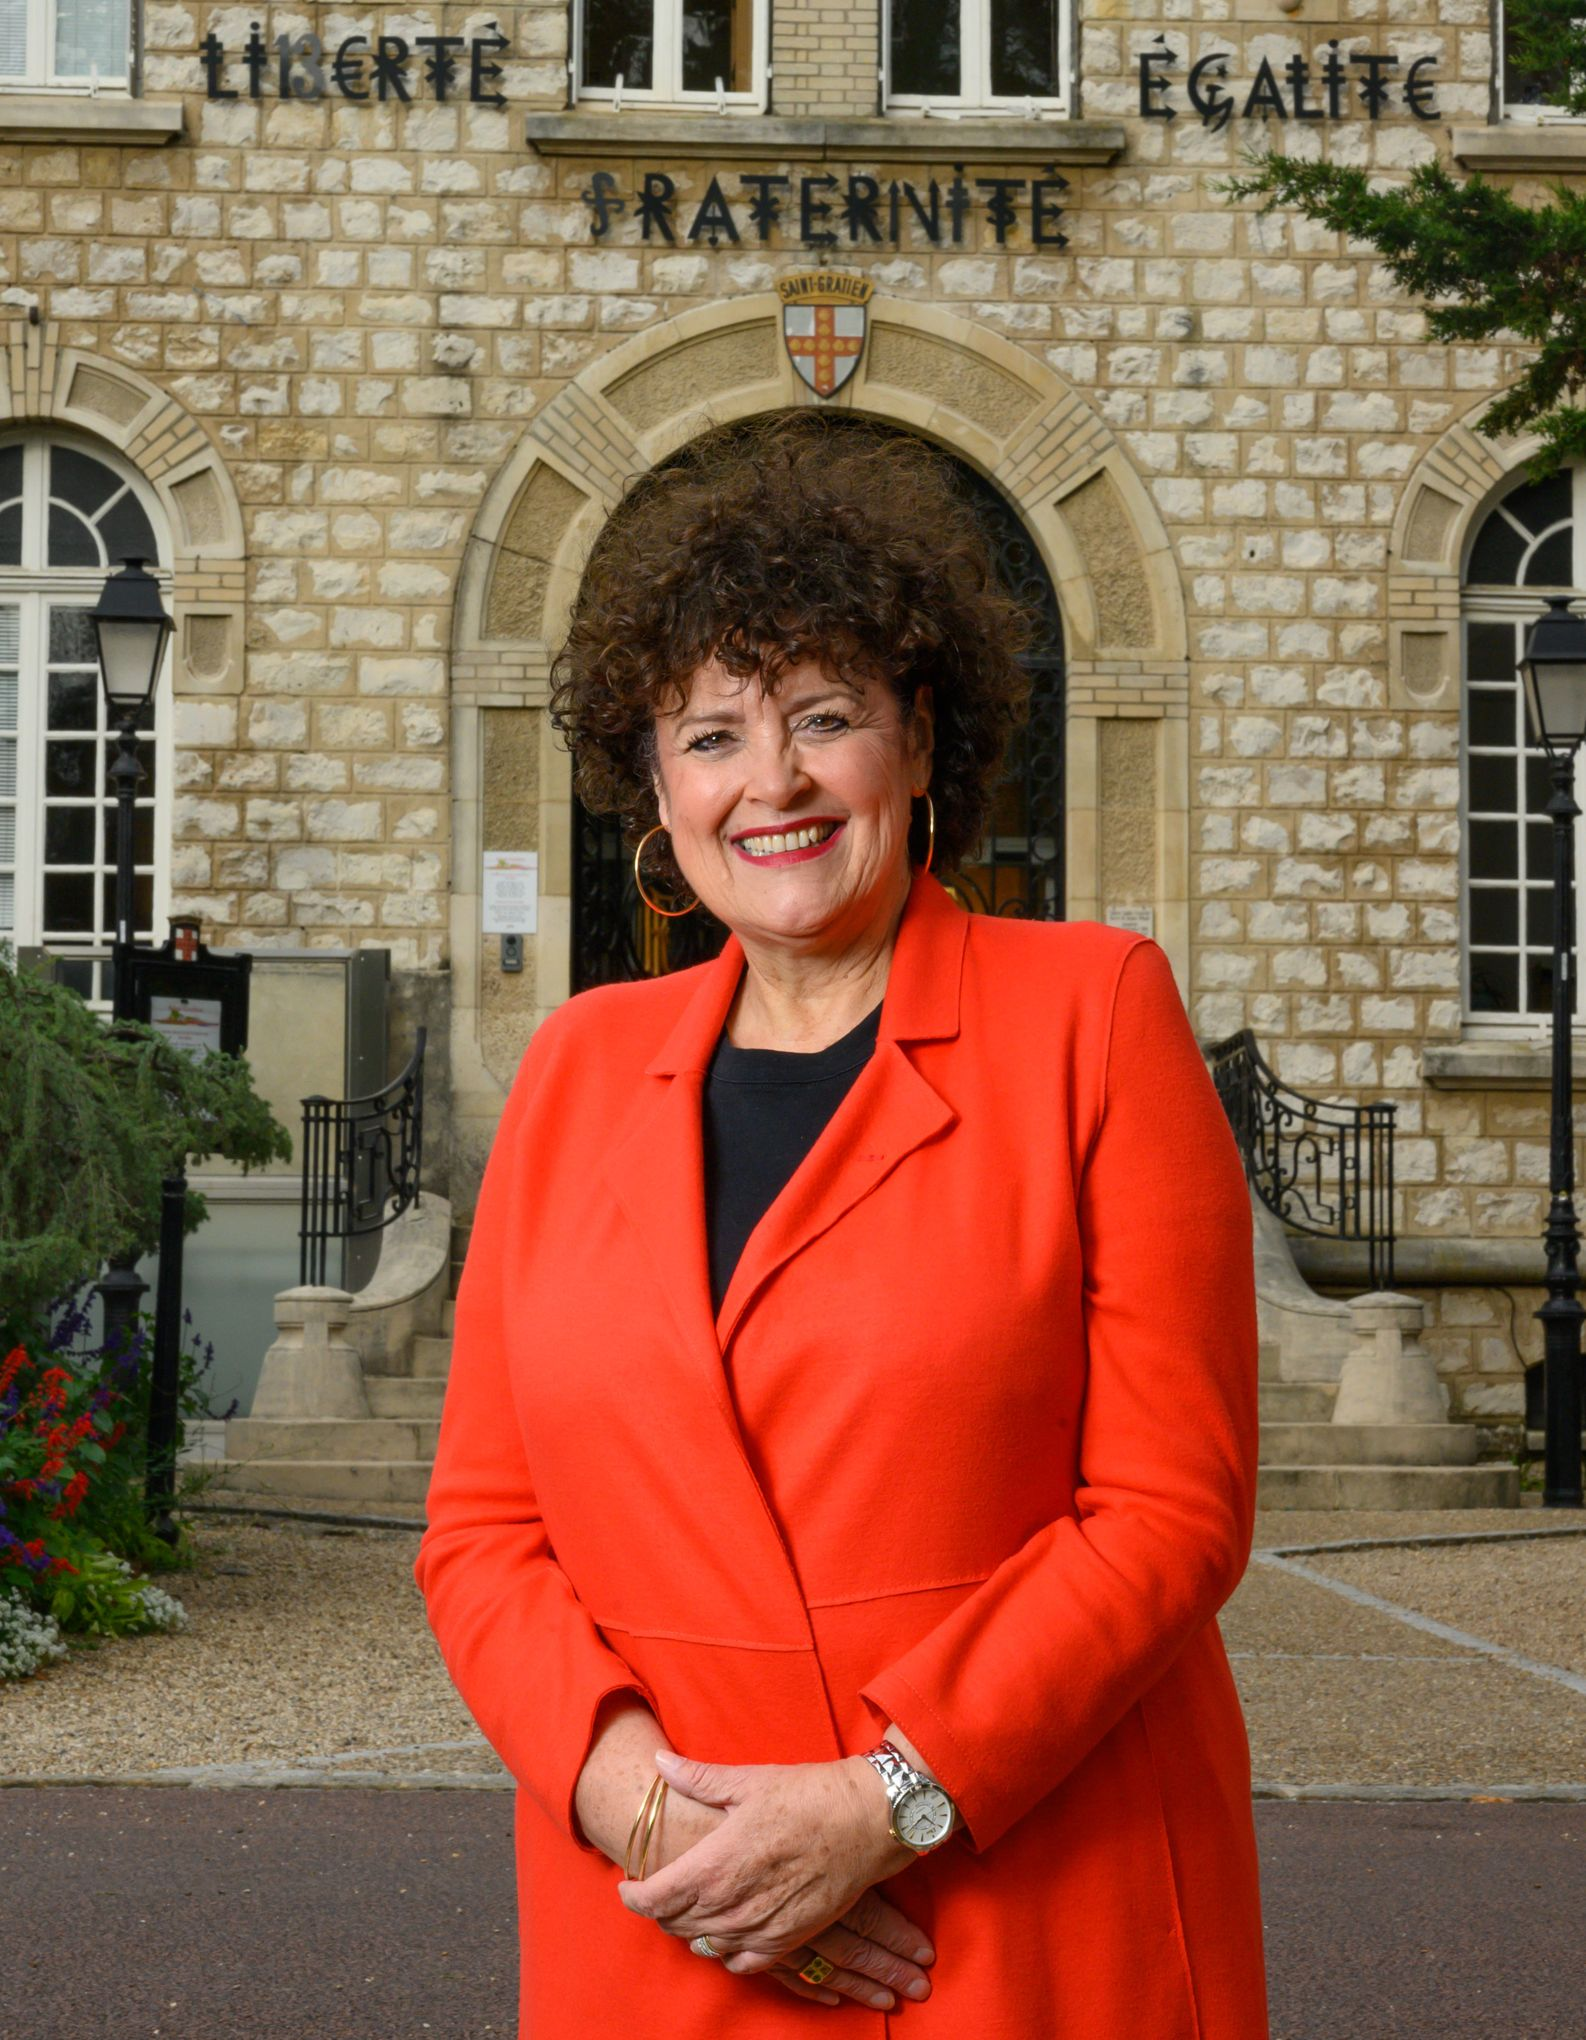 Signes religieux ostentatoires, Mickaël Harpon... Jacqueline Eustache-Brinio, une combattante de l'islamisme